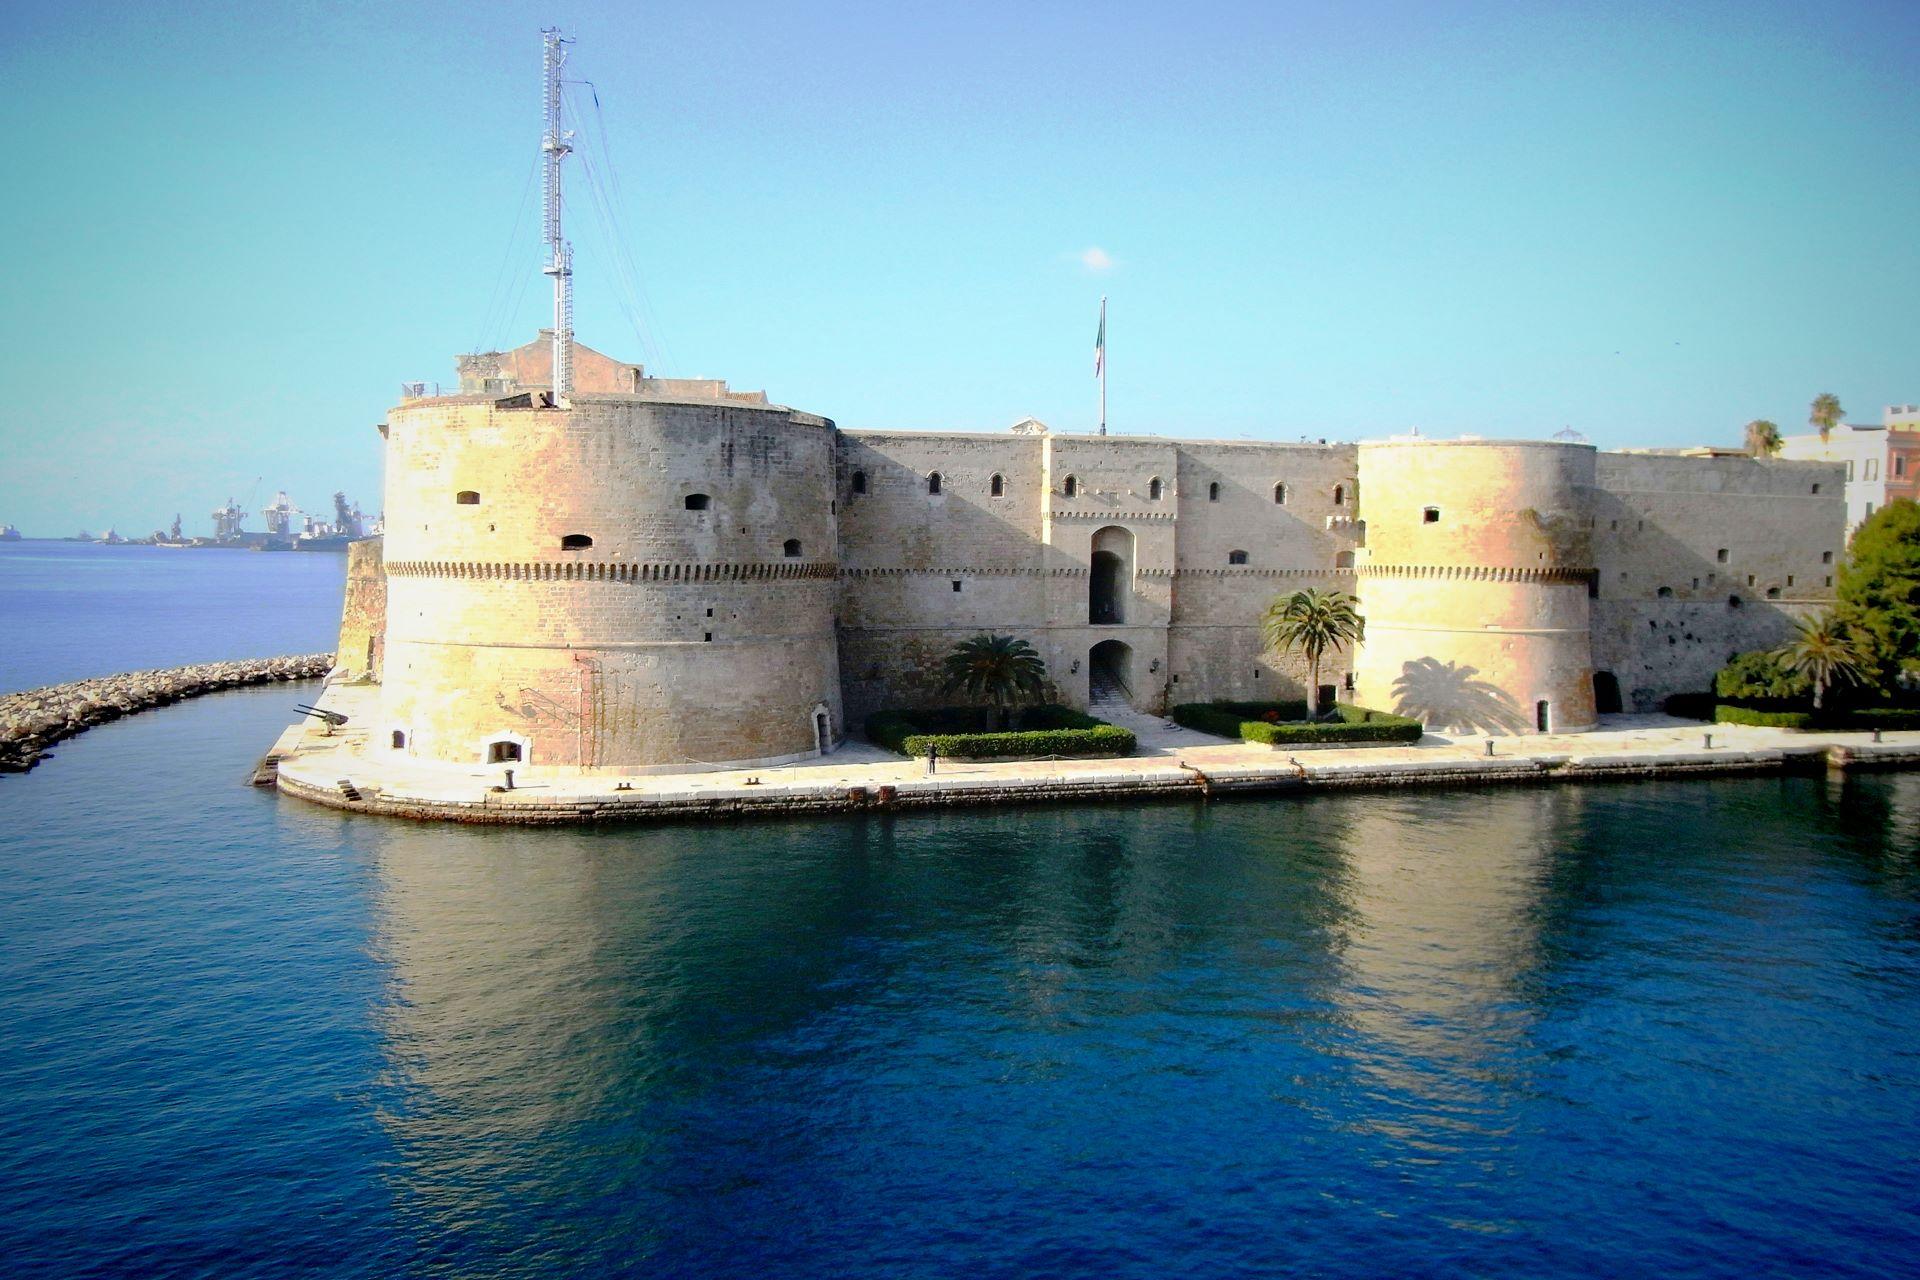 apulia slow travel taranto castello aragonese medioevo castle aragonesische burg due mari zwei meere grossgriechenland magna graecia